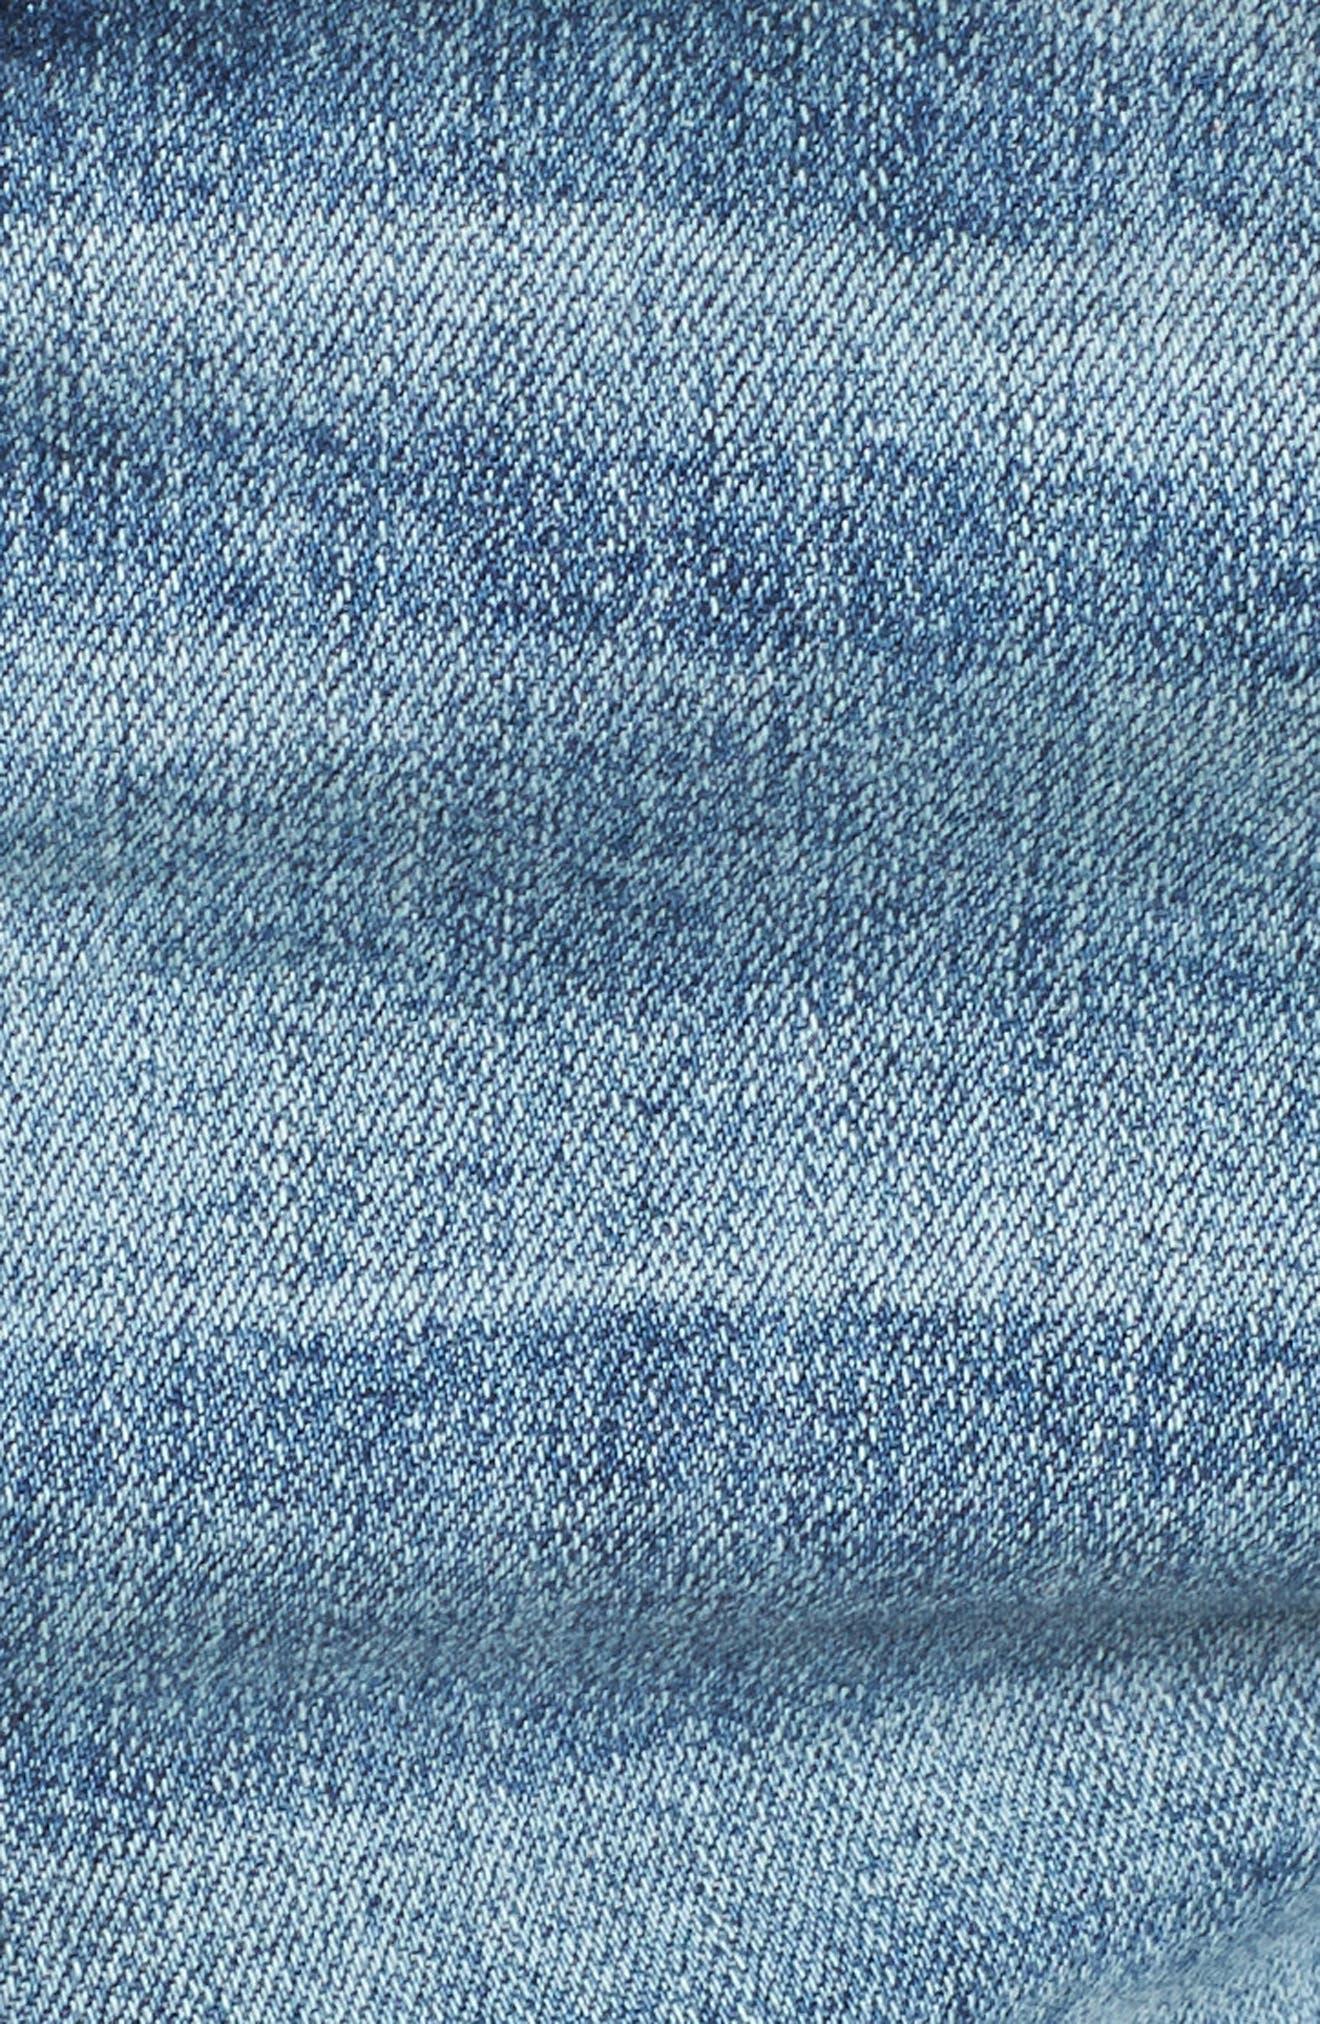 STS Blue Distressed High Waist Denim Shorts,                             Alternate thumbnail 6, color,                             402